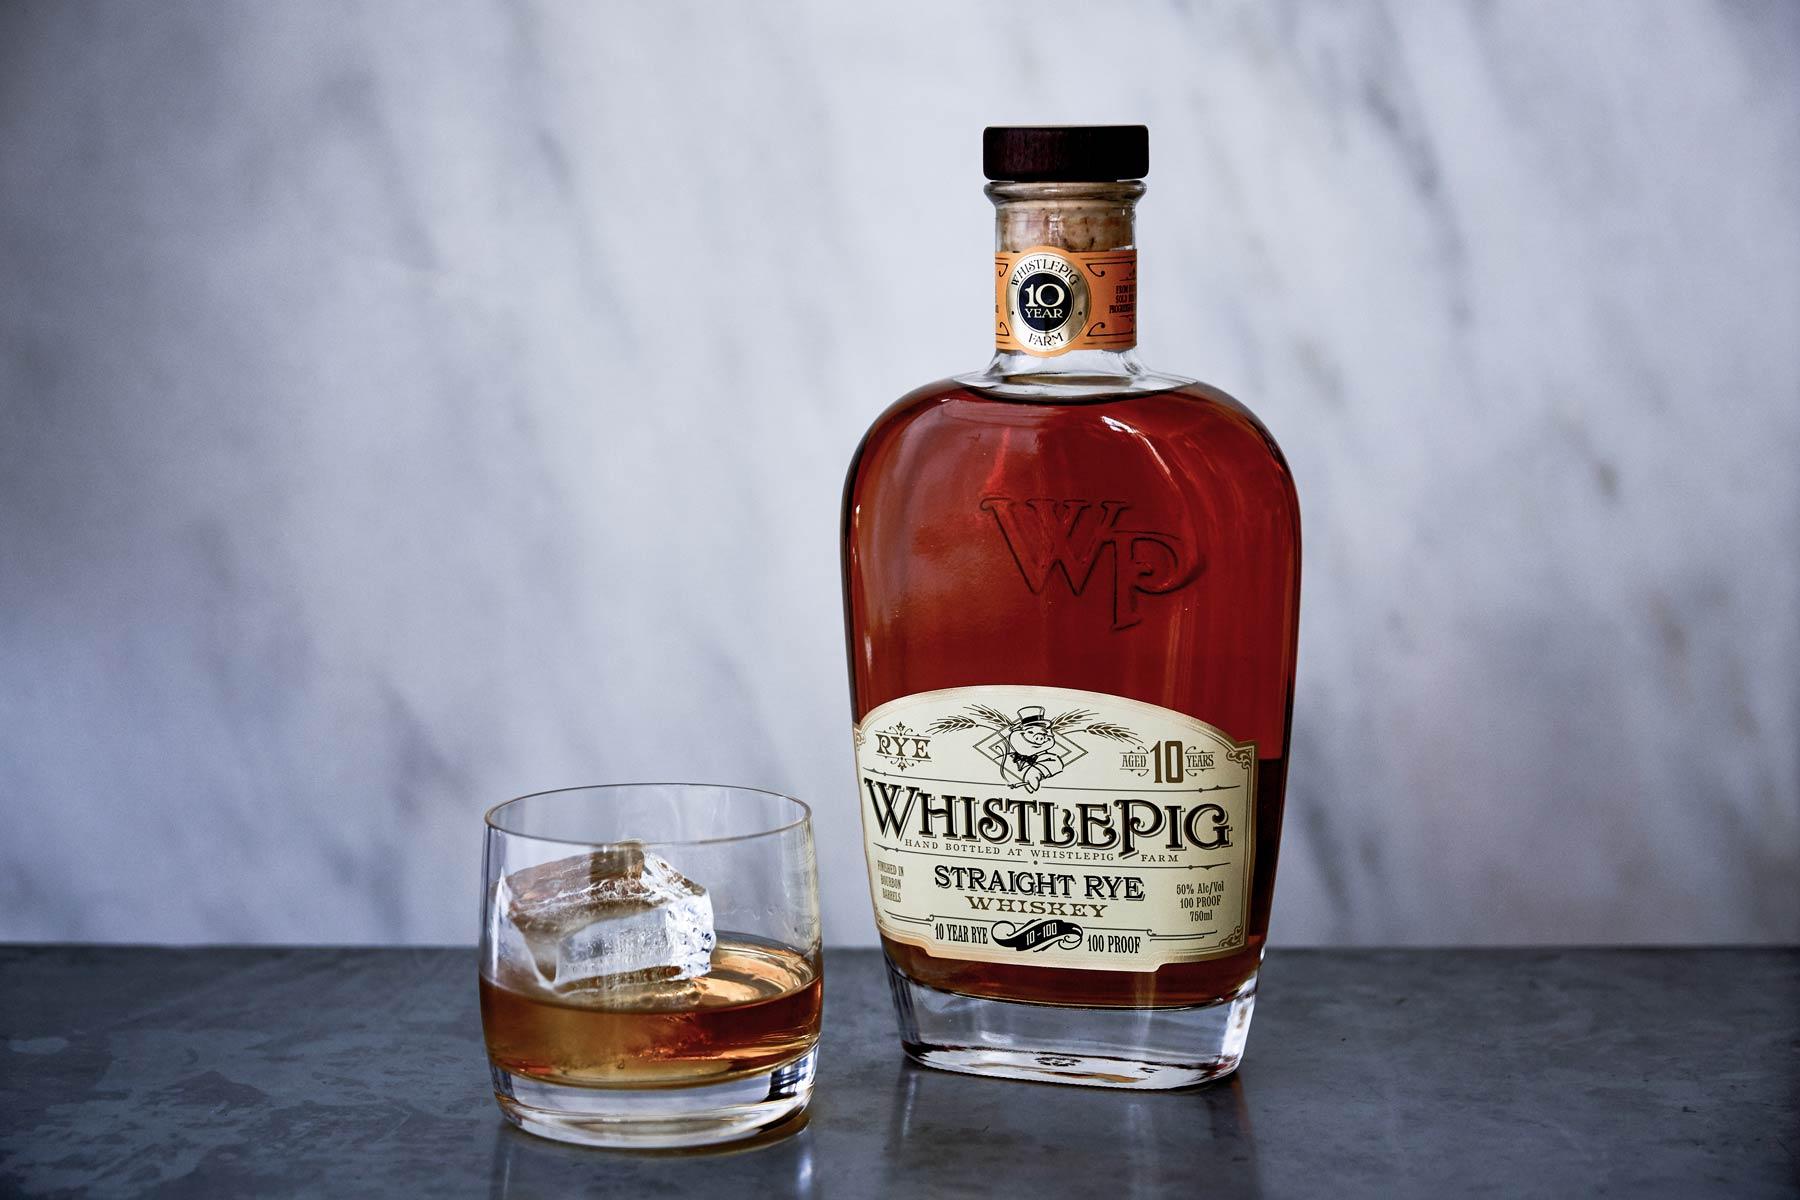 WhistlePig Cocktails - Caskers